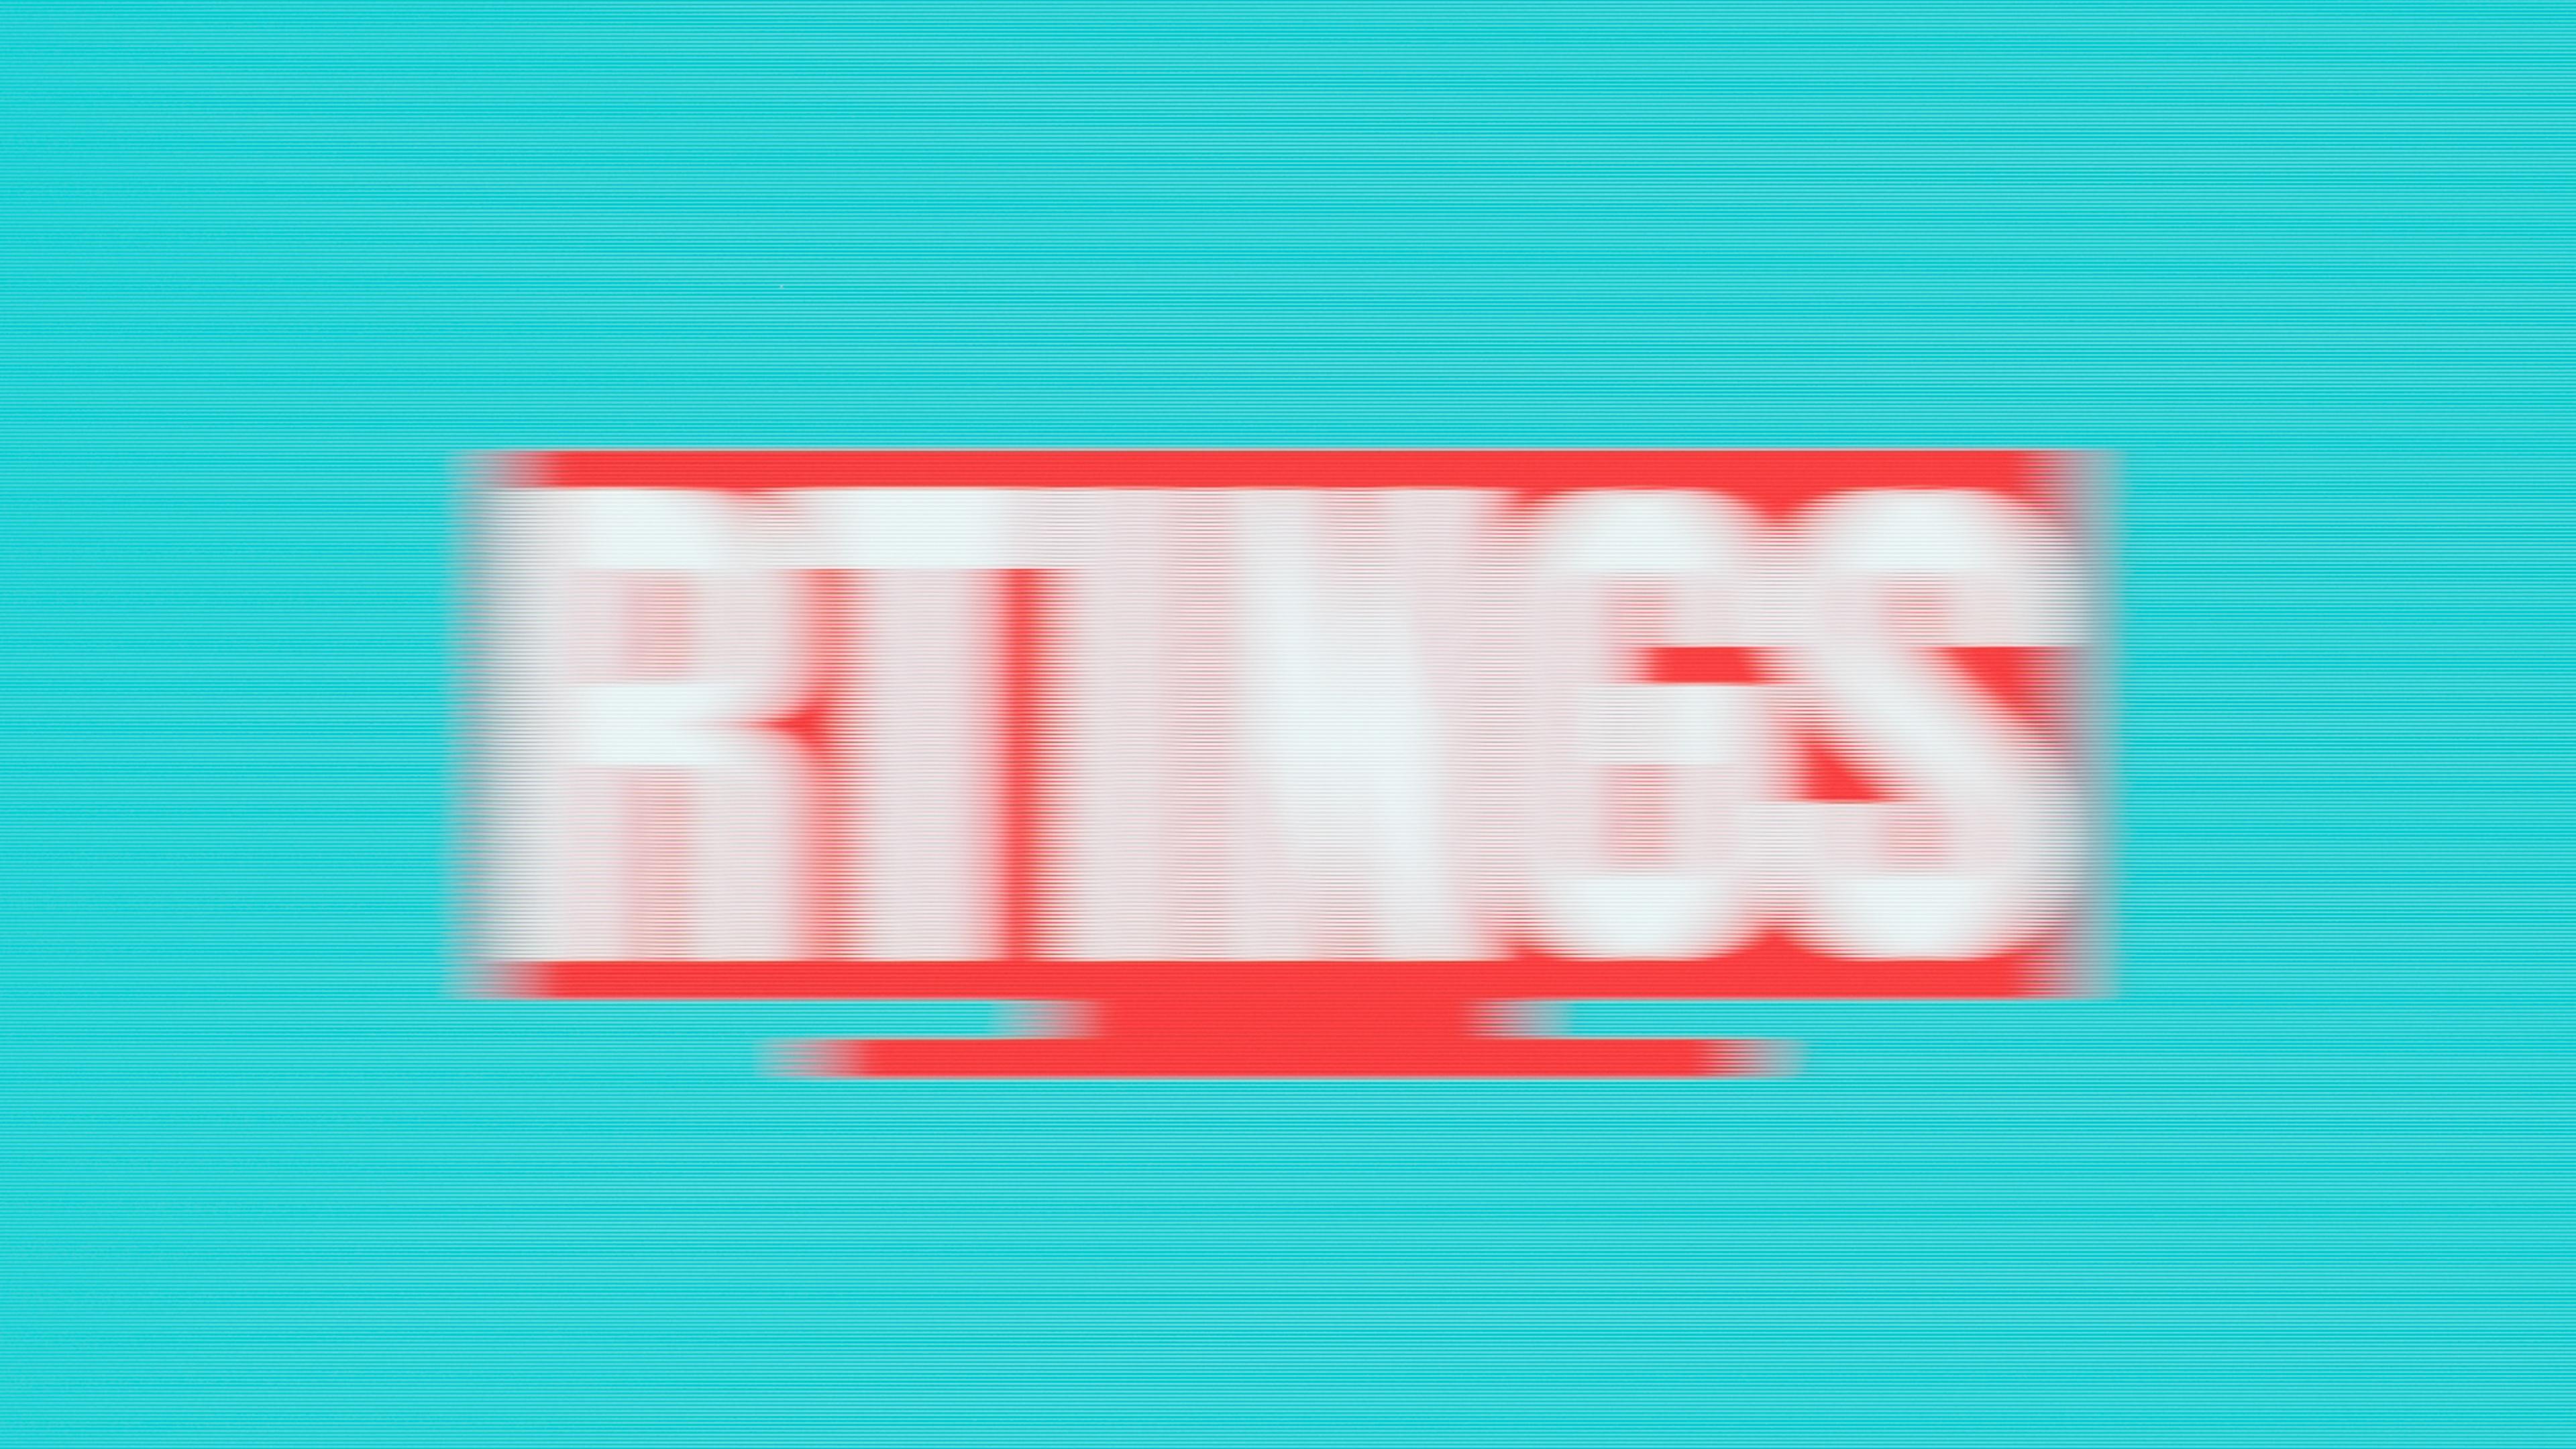 Motion Blur of TVs - RTINGS.com